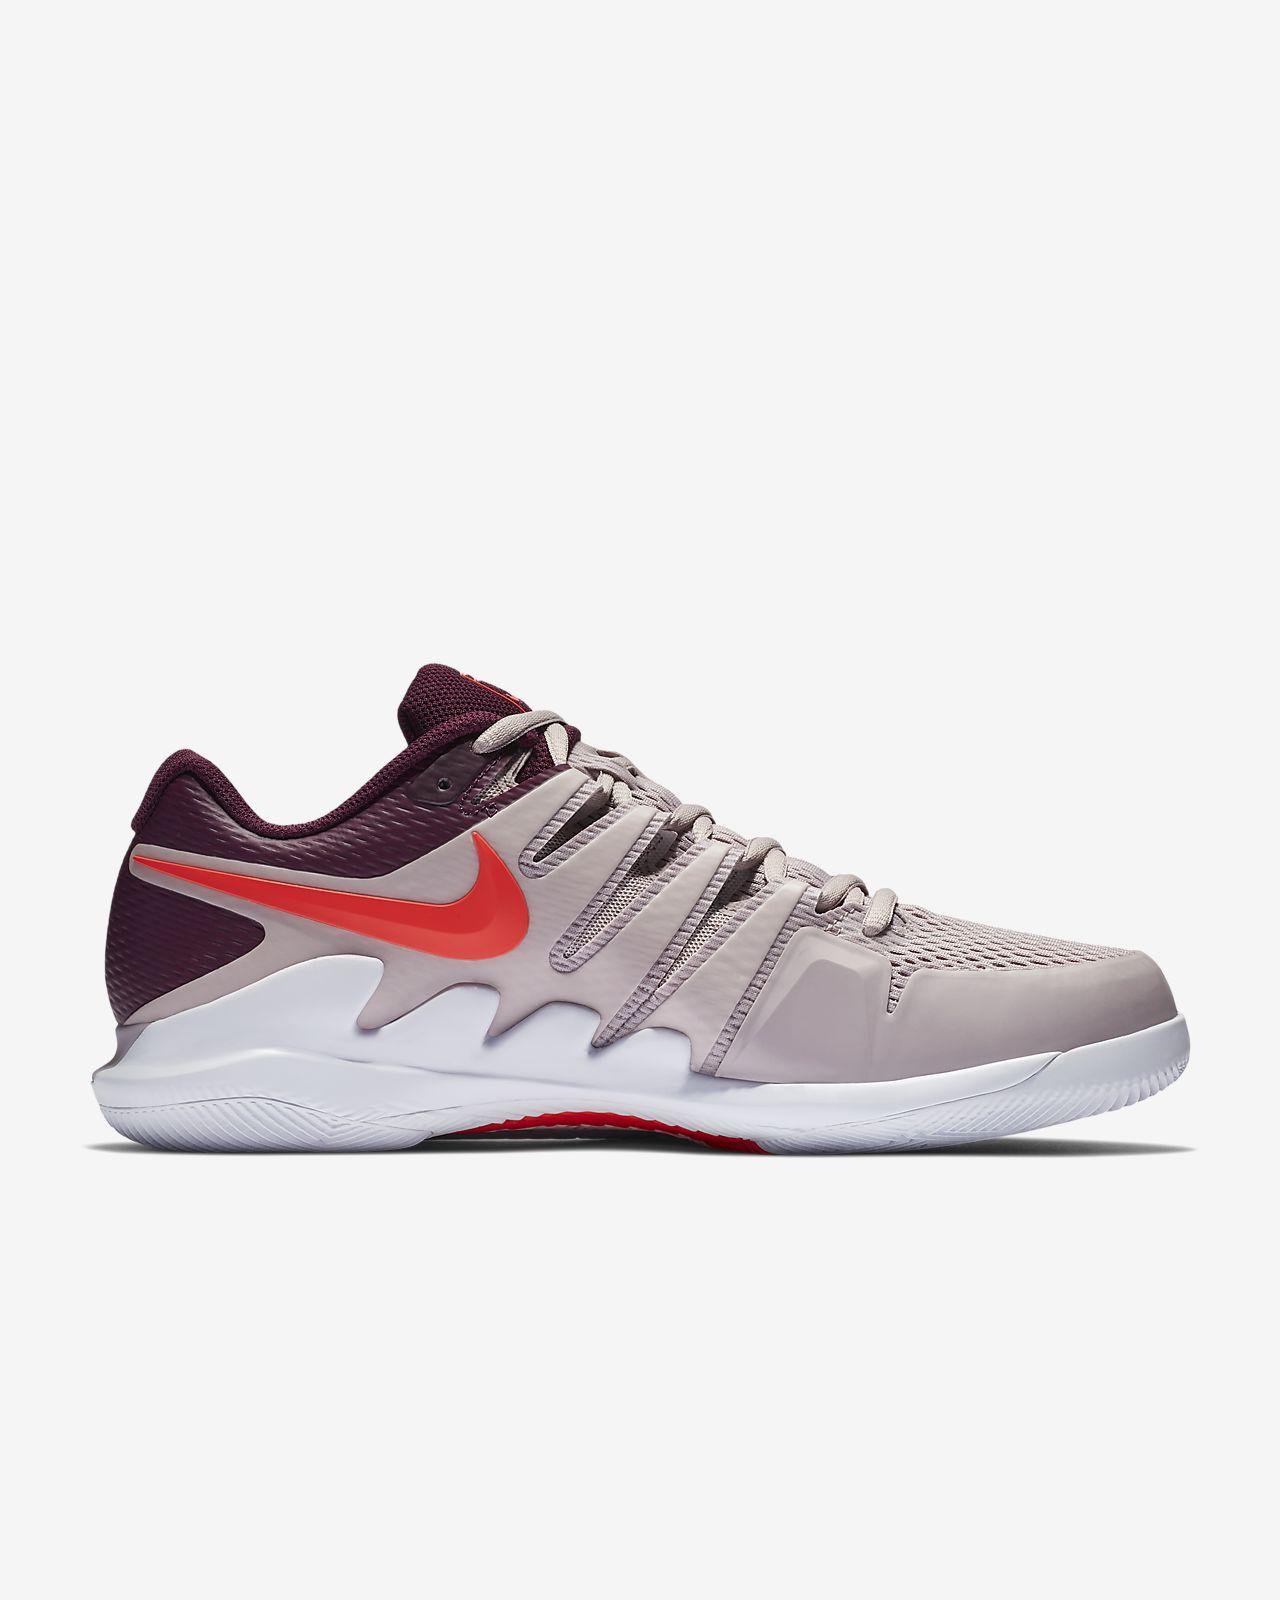 super popular 4e286 37f05 ... NikeCourt Air Zoom Vapor X Men s Hard Court Tennis Shoe